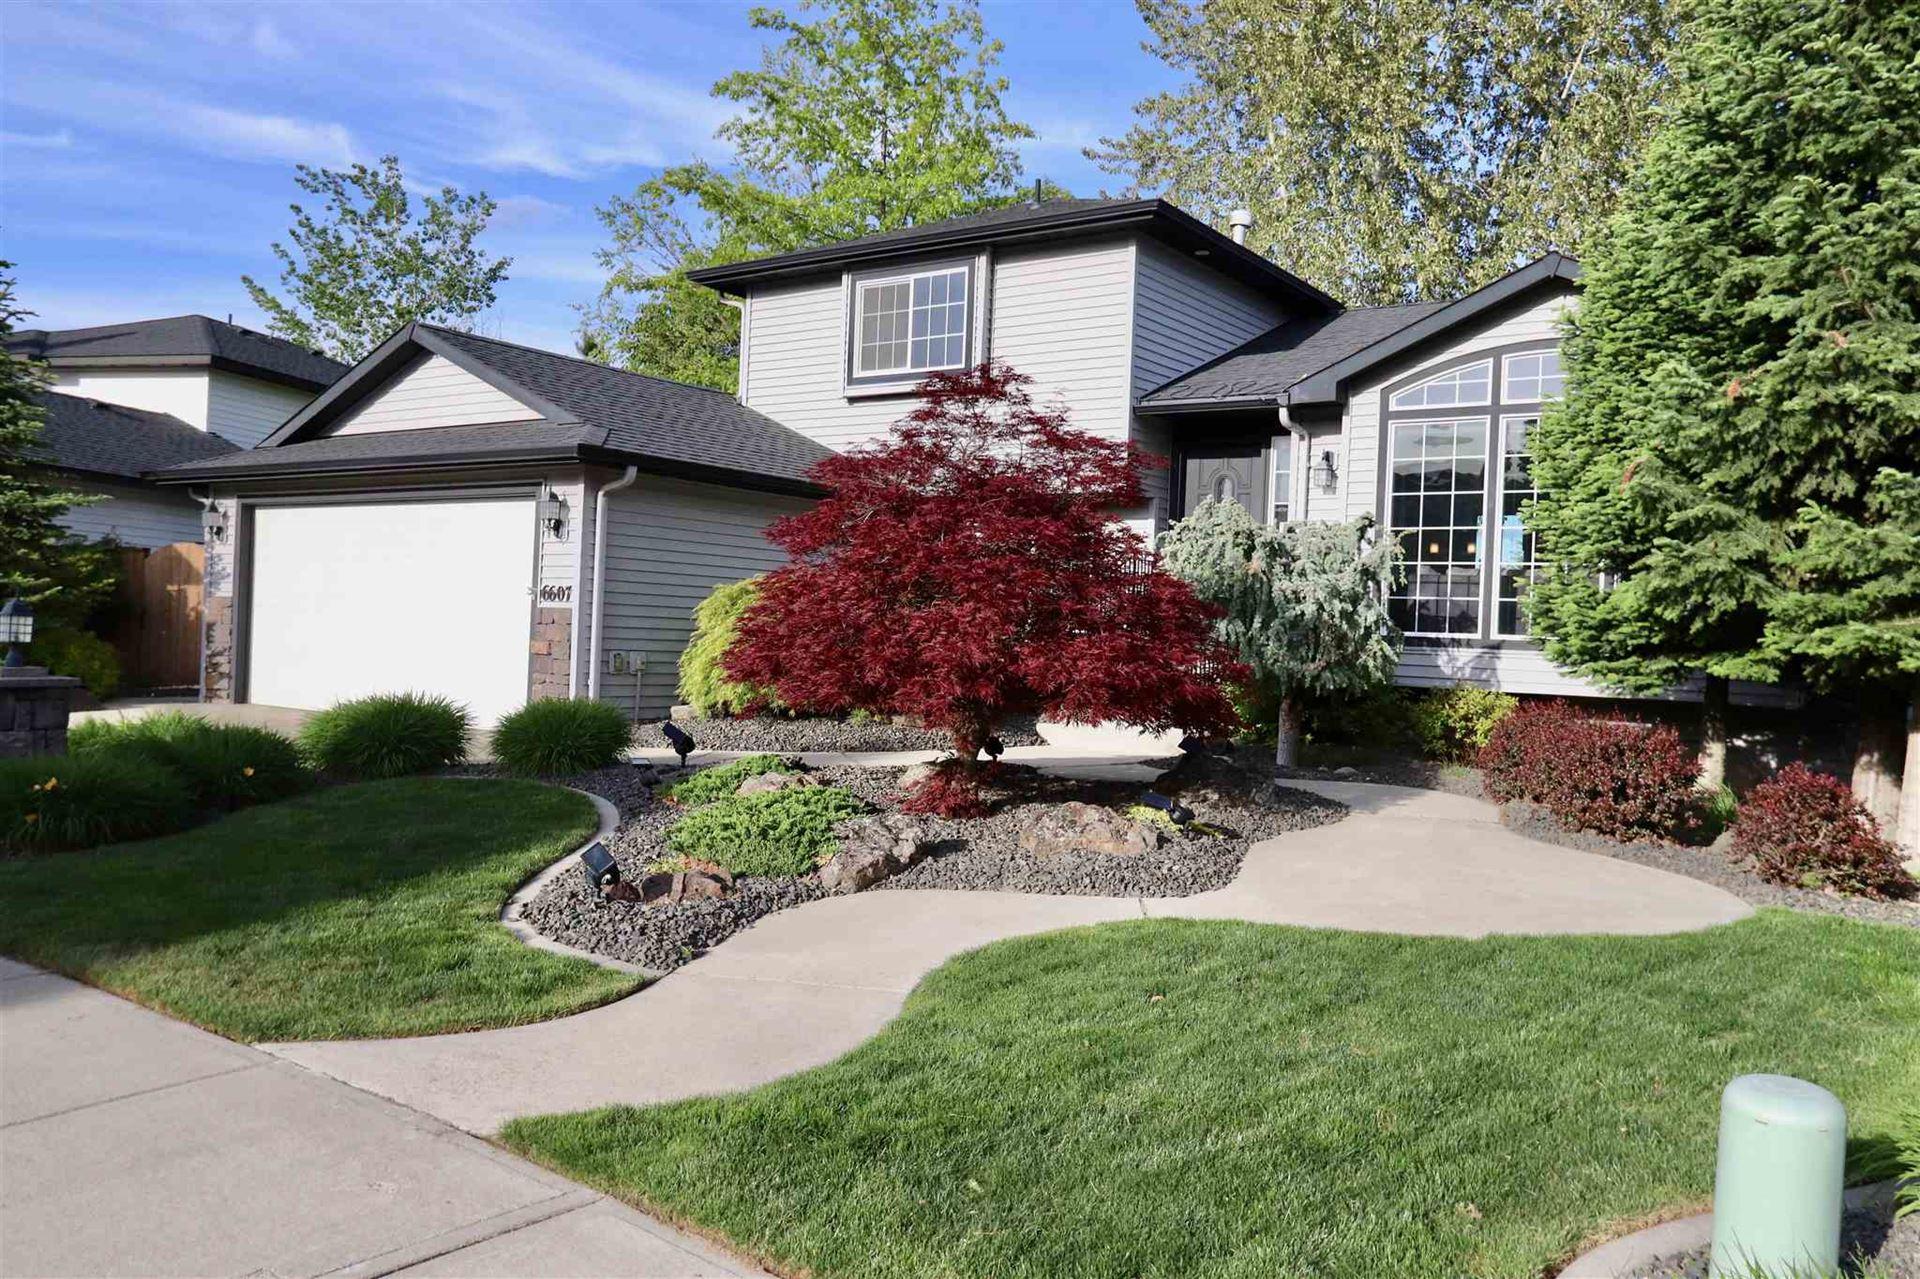 6607 S Baymont St, Spokane, WA 99224 - #: 202116227